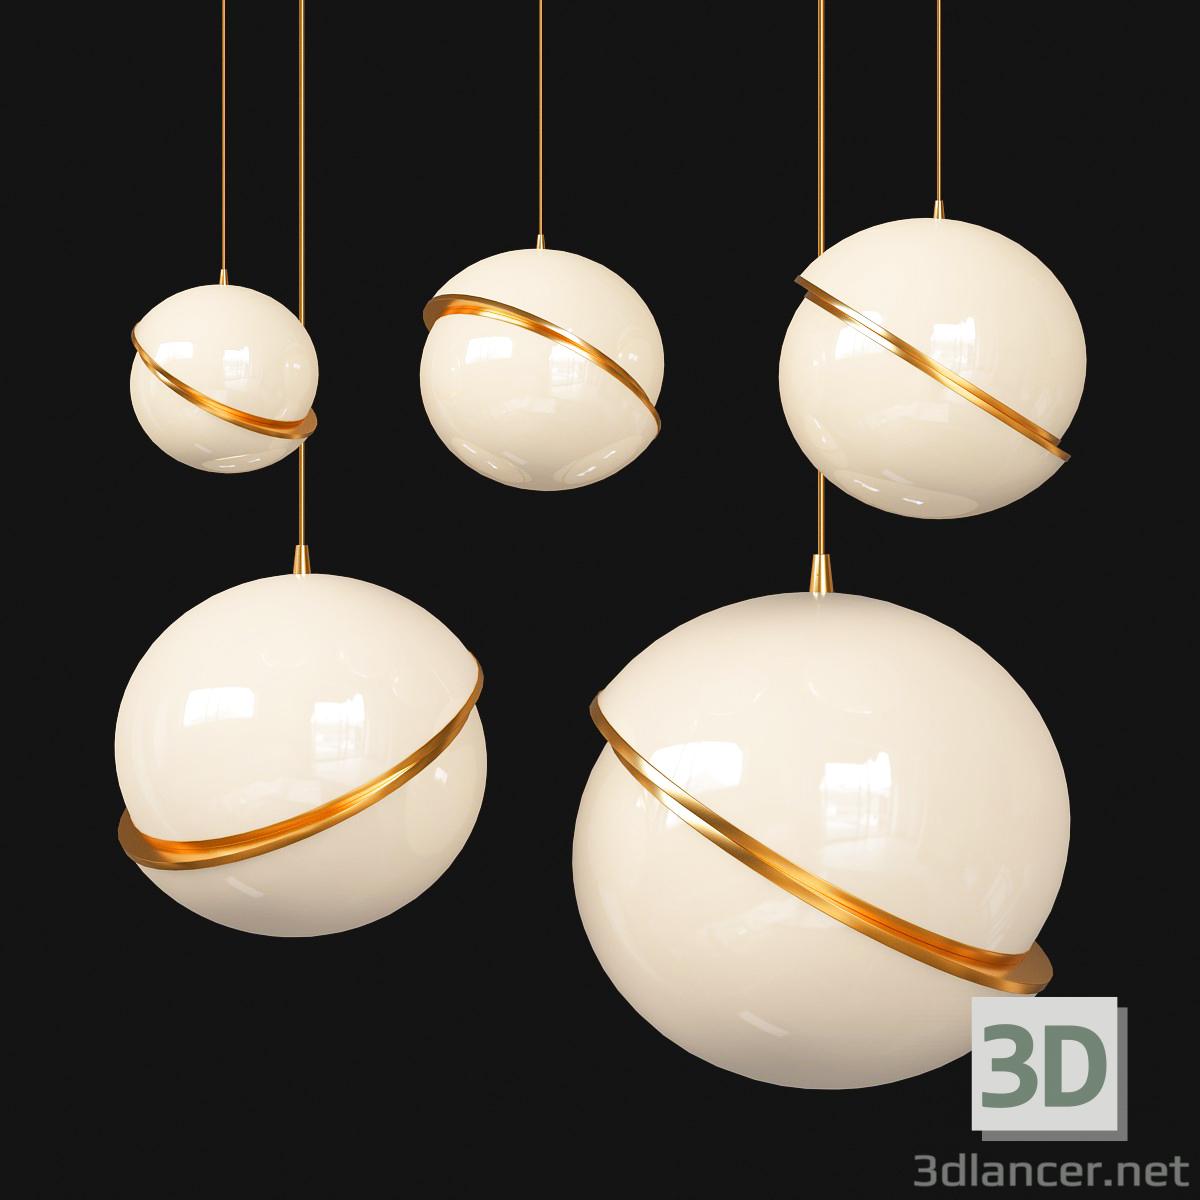 3d CRESCENT Pendant Light model buy - render